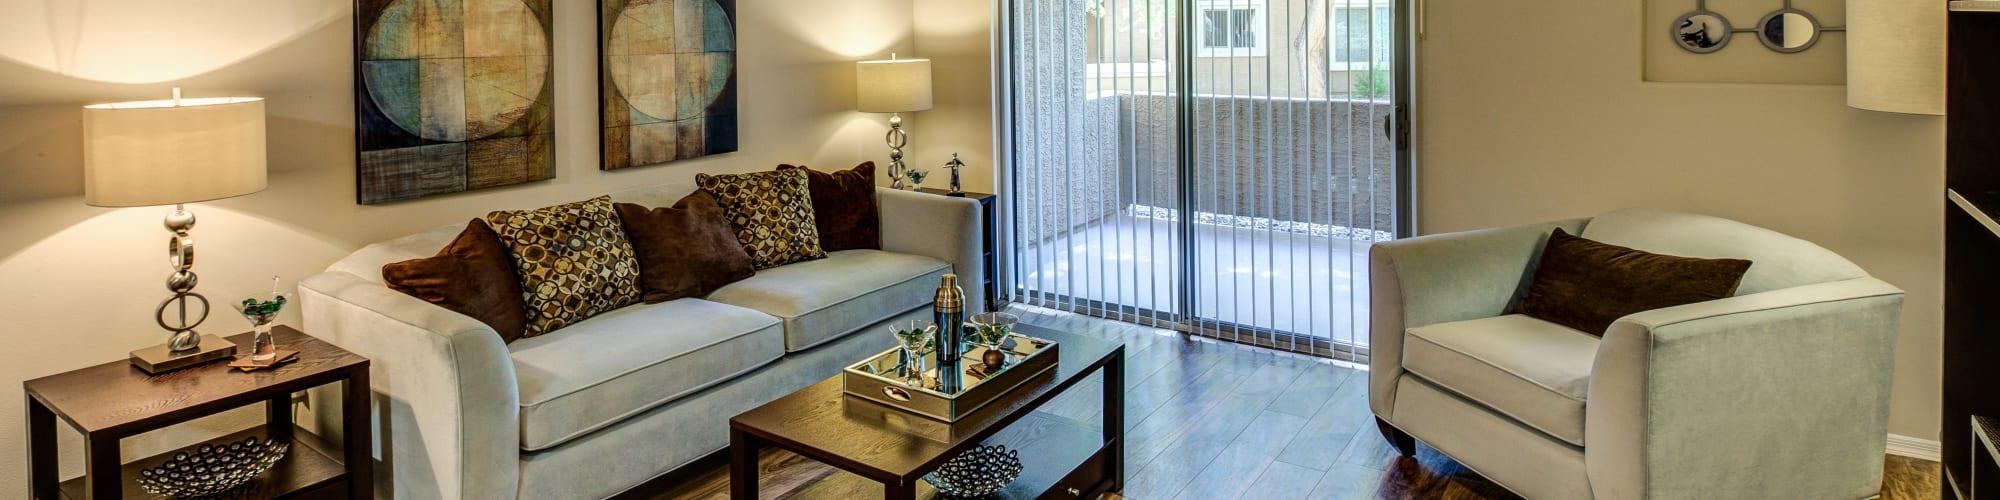 Floor plans at The Regents at Scottsdale in Scottsdale, Arizona